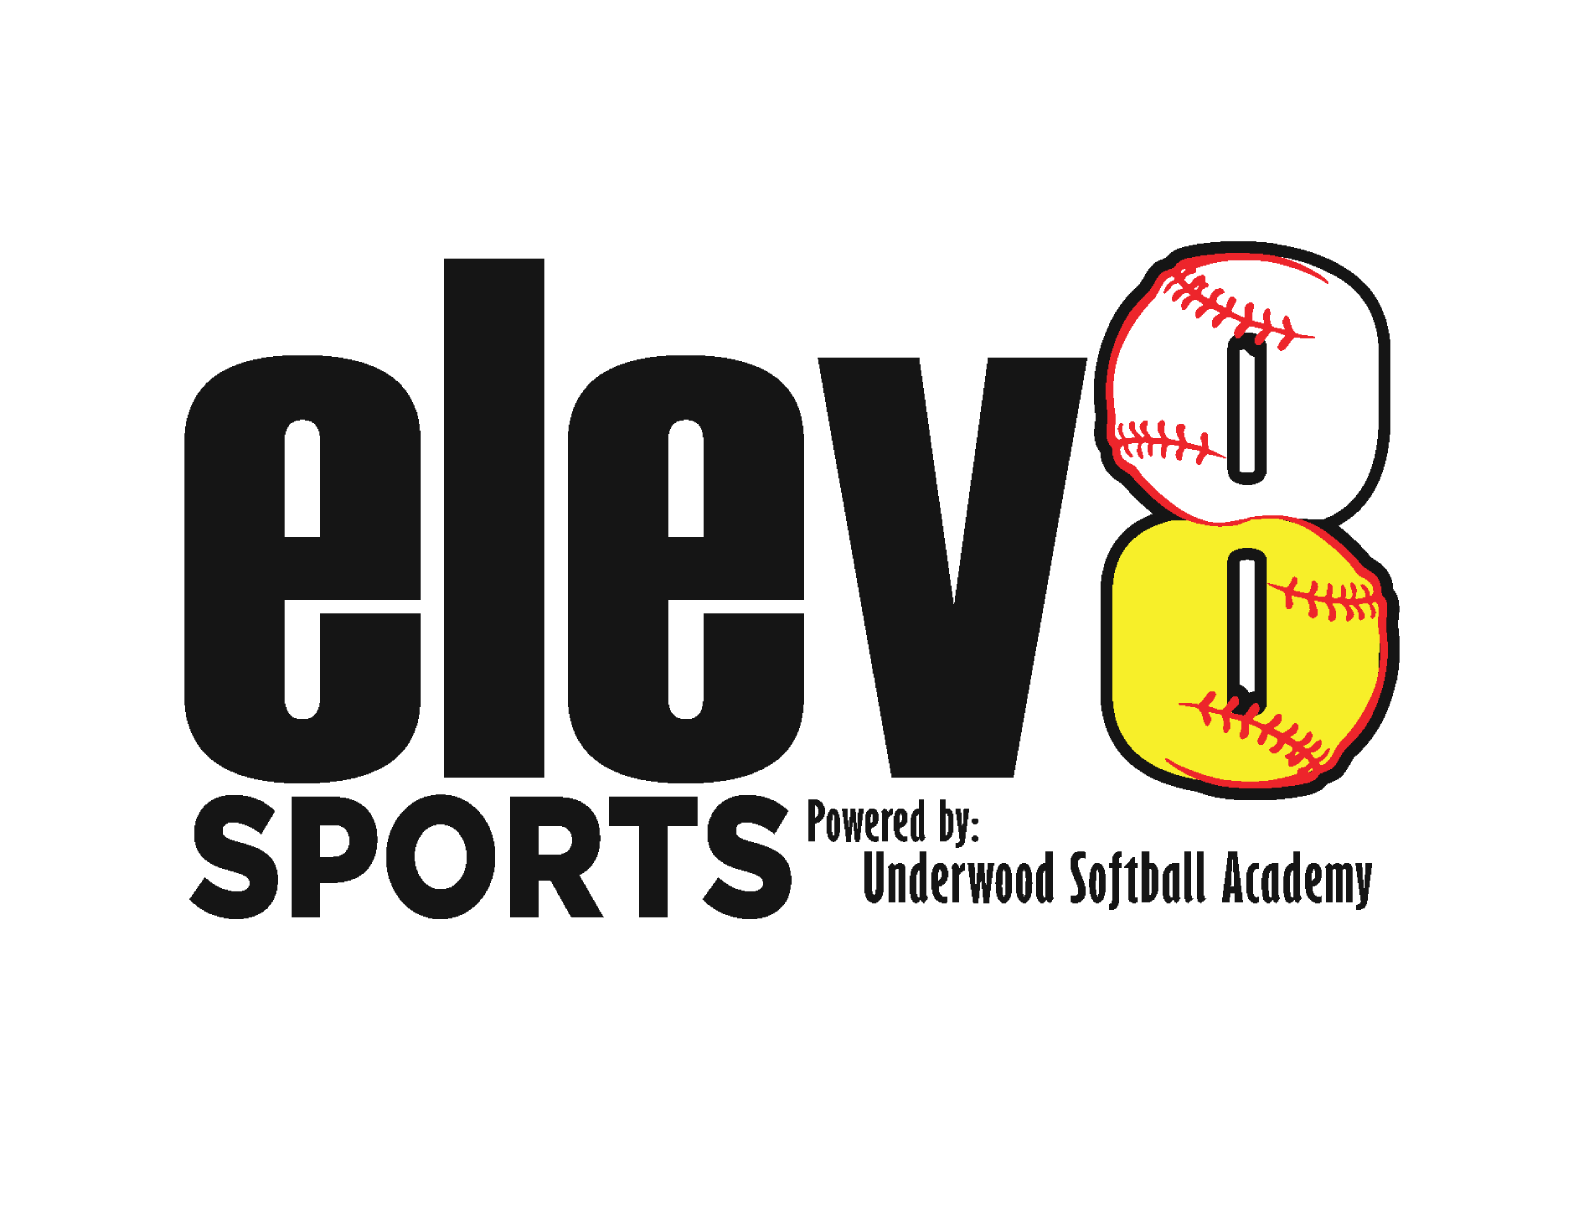 www.elev8sports.com